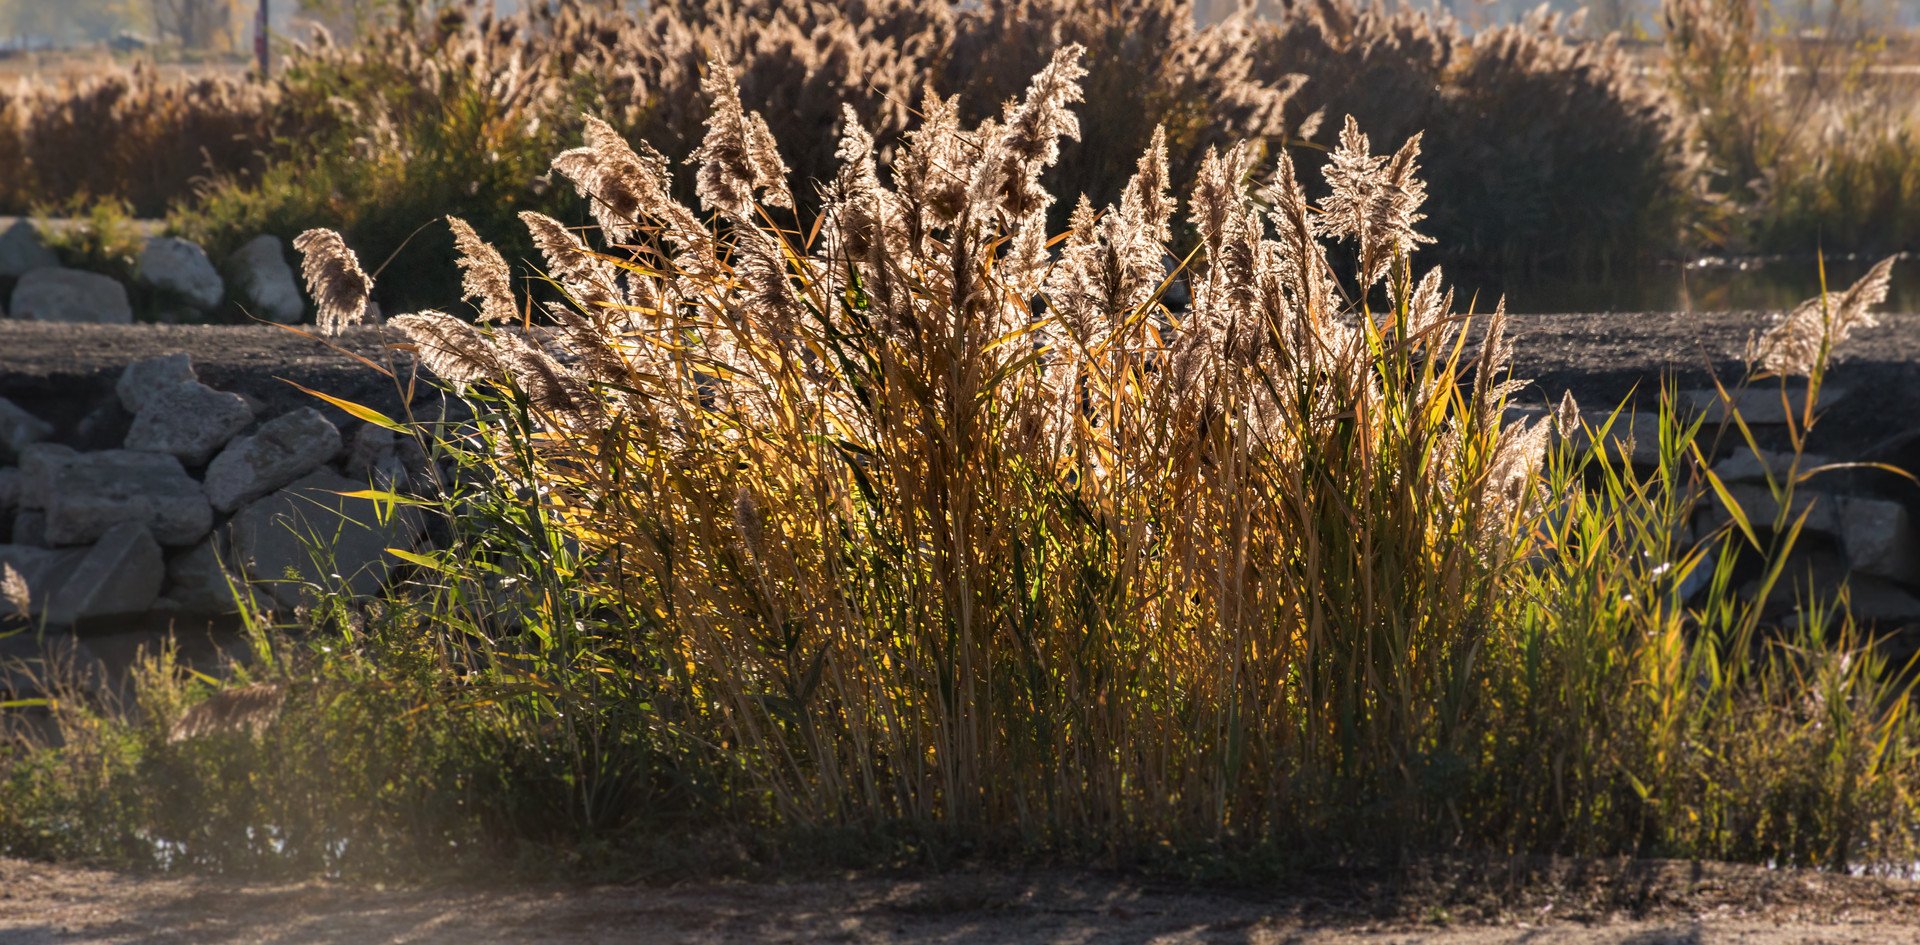 Tuft of Grass-1.jpg